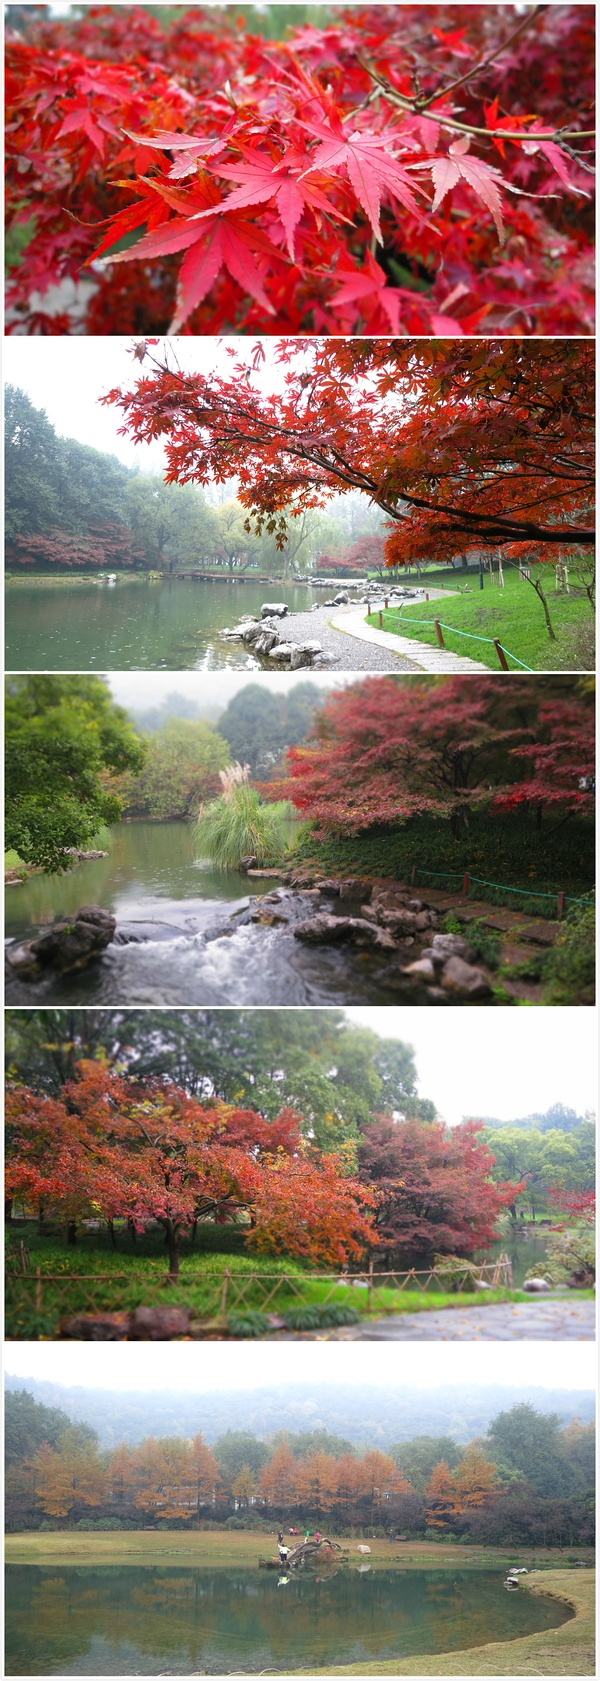 Prince Bay Park Hangzhou